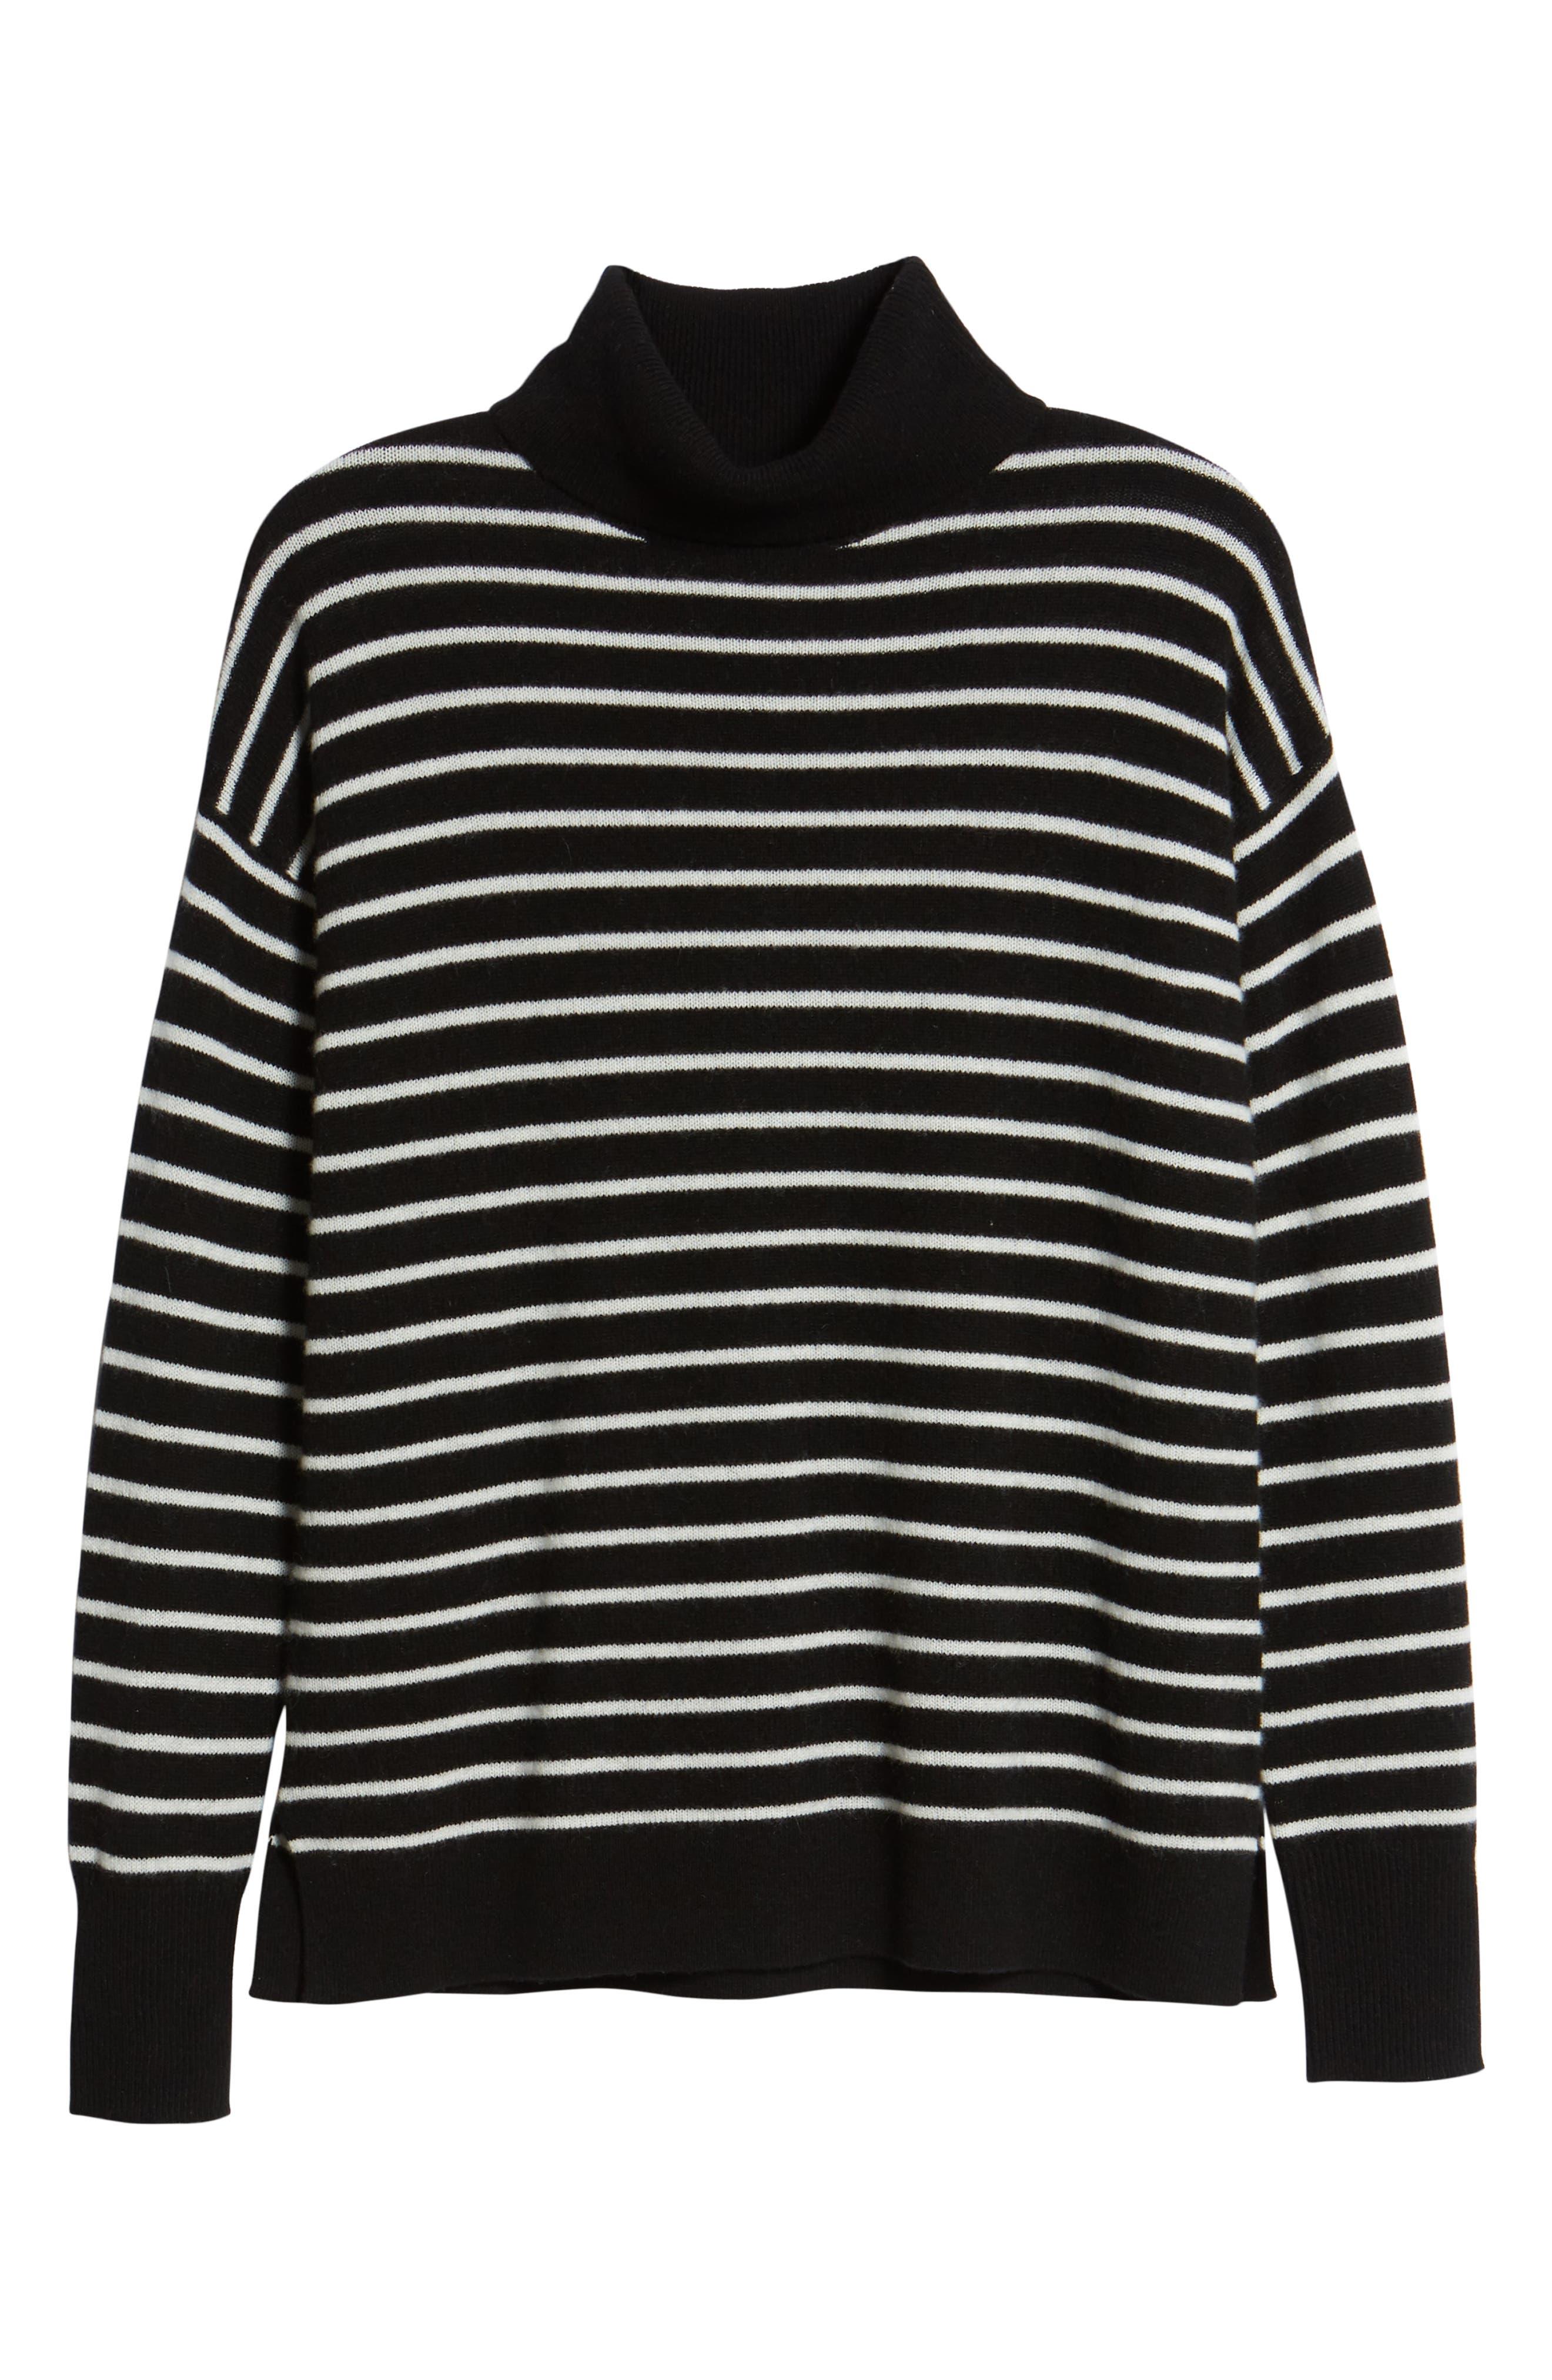 Cashmere Turtleneck Sweater,                             Alternate thumbnail 6, color,                             BLACK- IVORY STRIPE